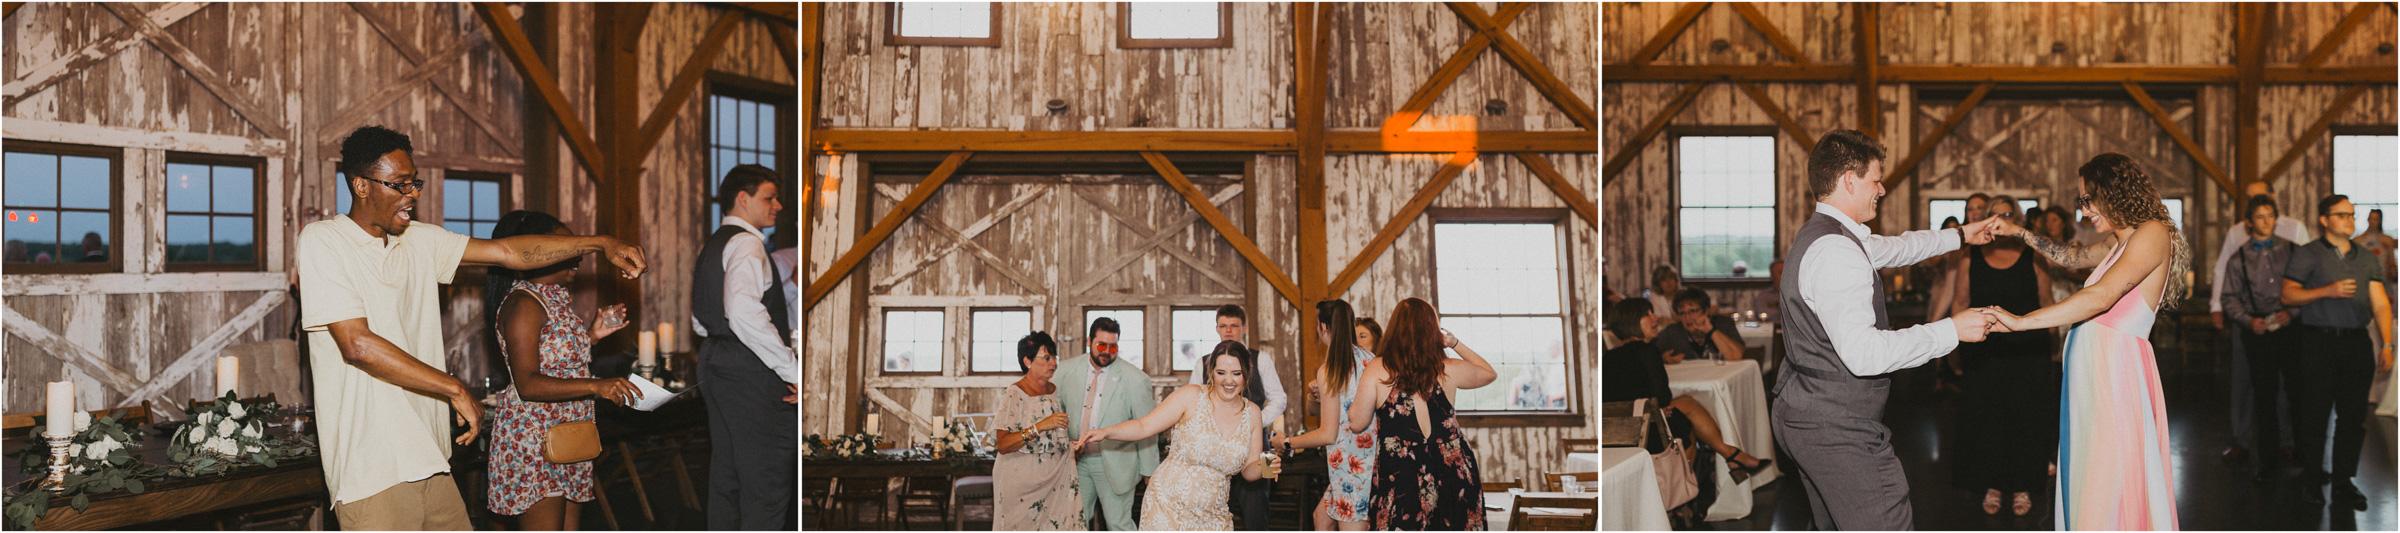 alyssa barletter photography weston red barn farm timberbarn summer outdoor wedding-67.jpg